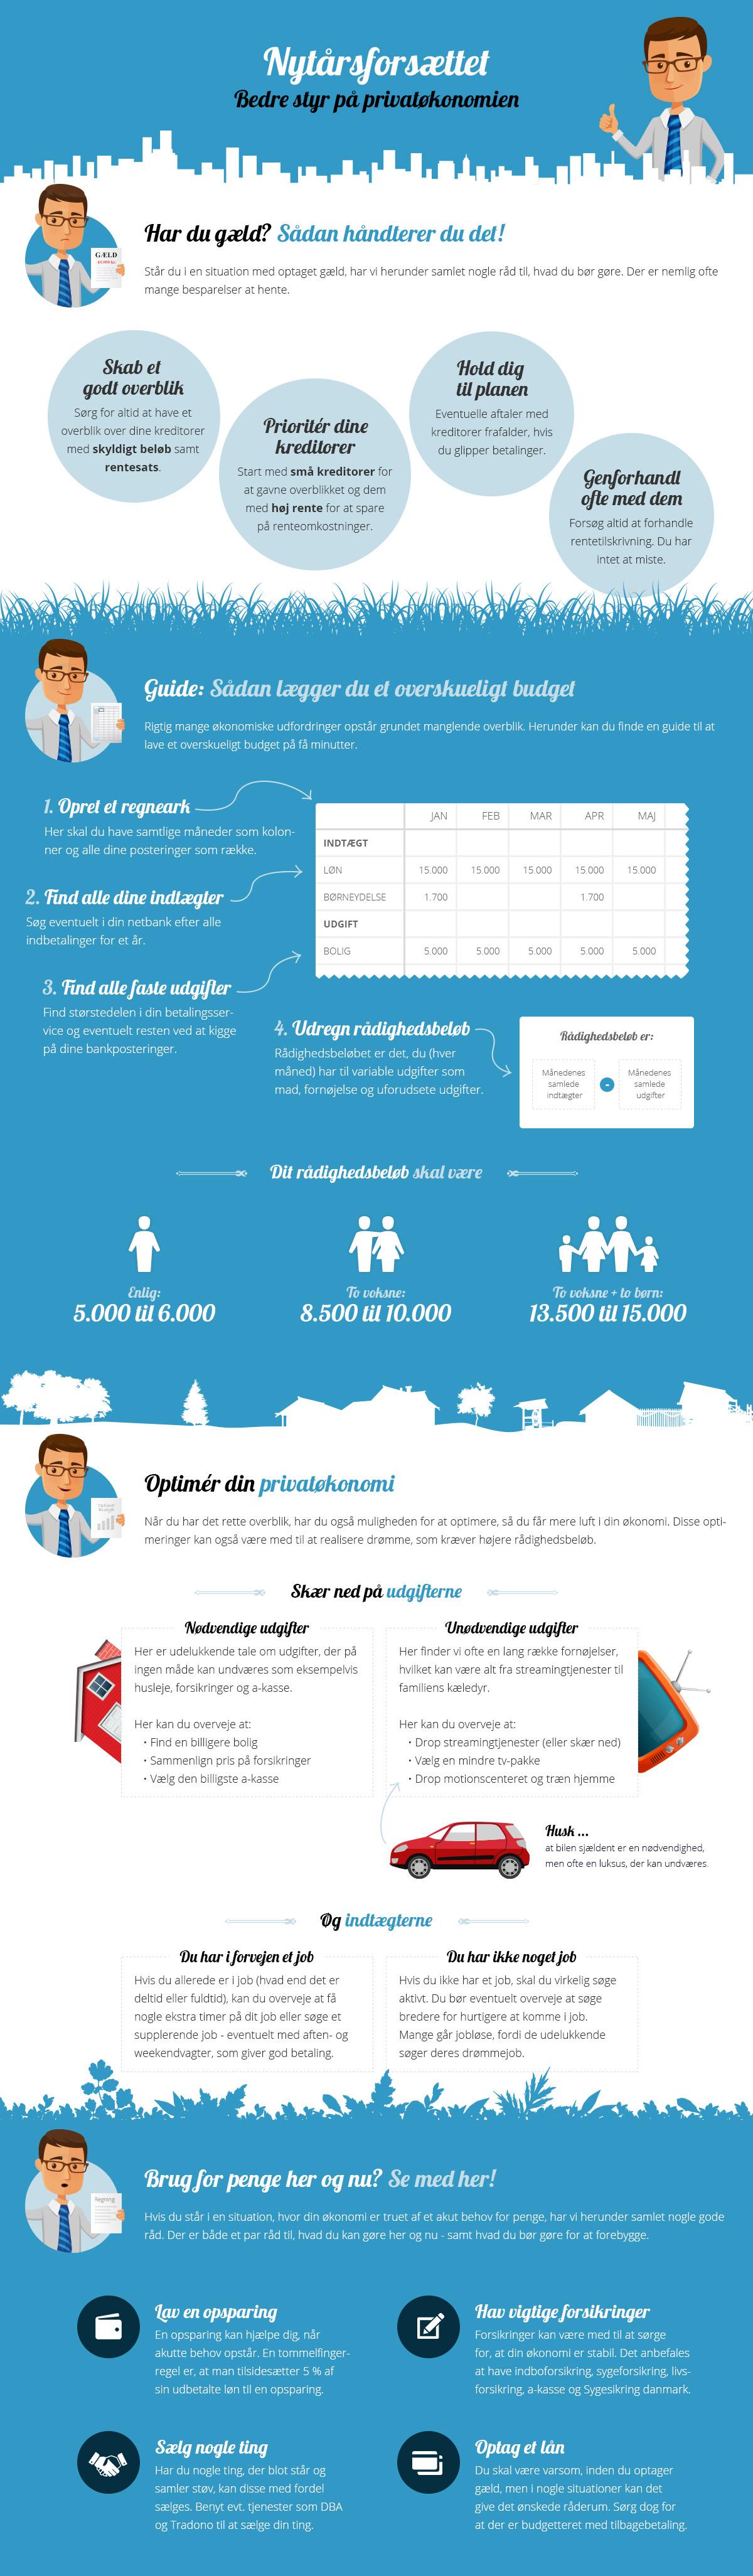 Infografik: Bedre privatøkonomi